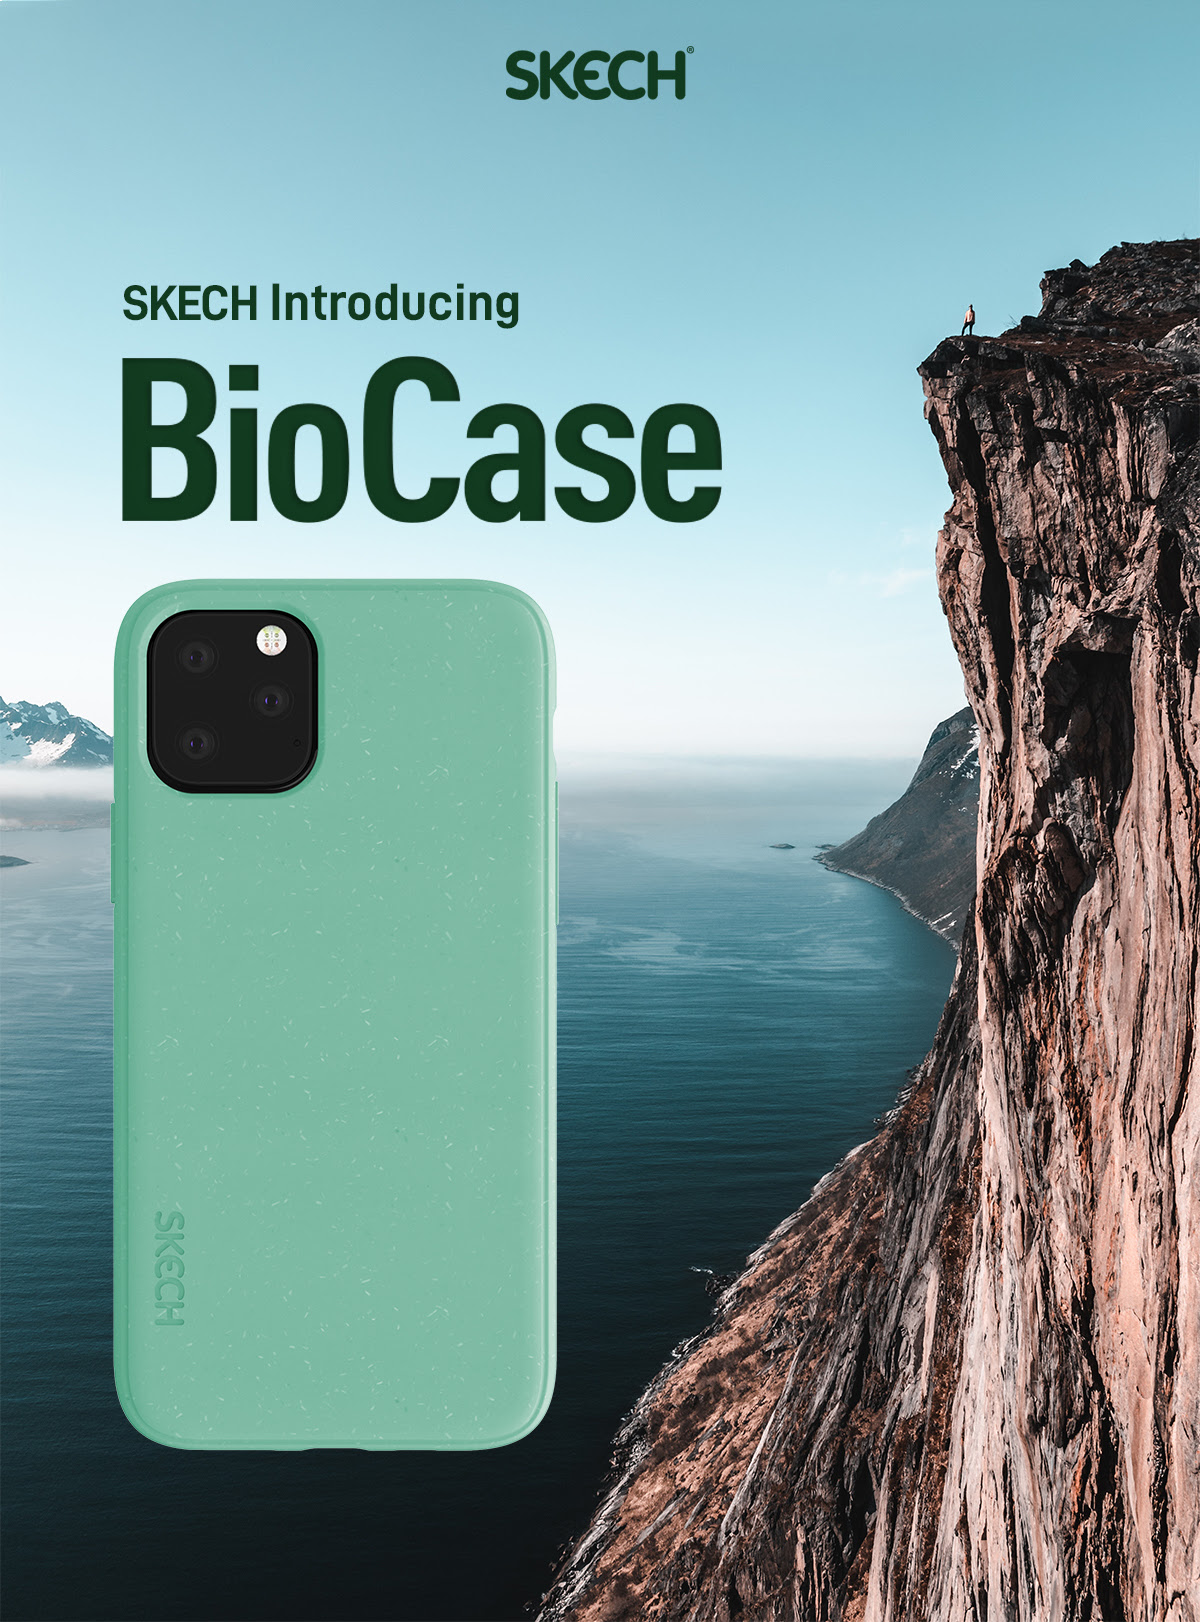 SKECH biocase iphone 11